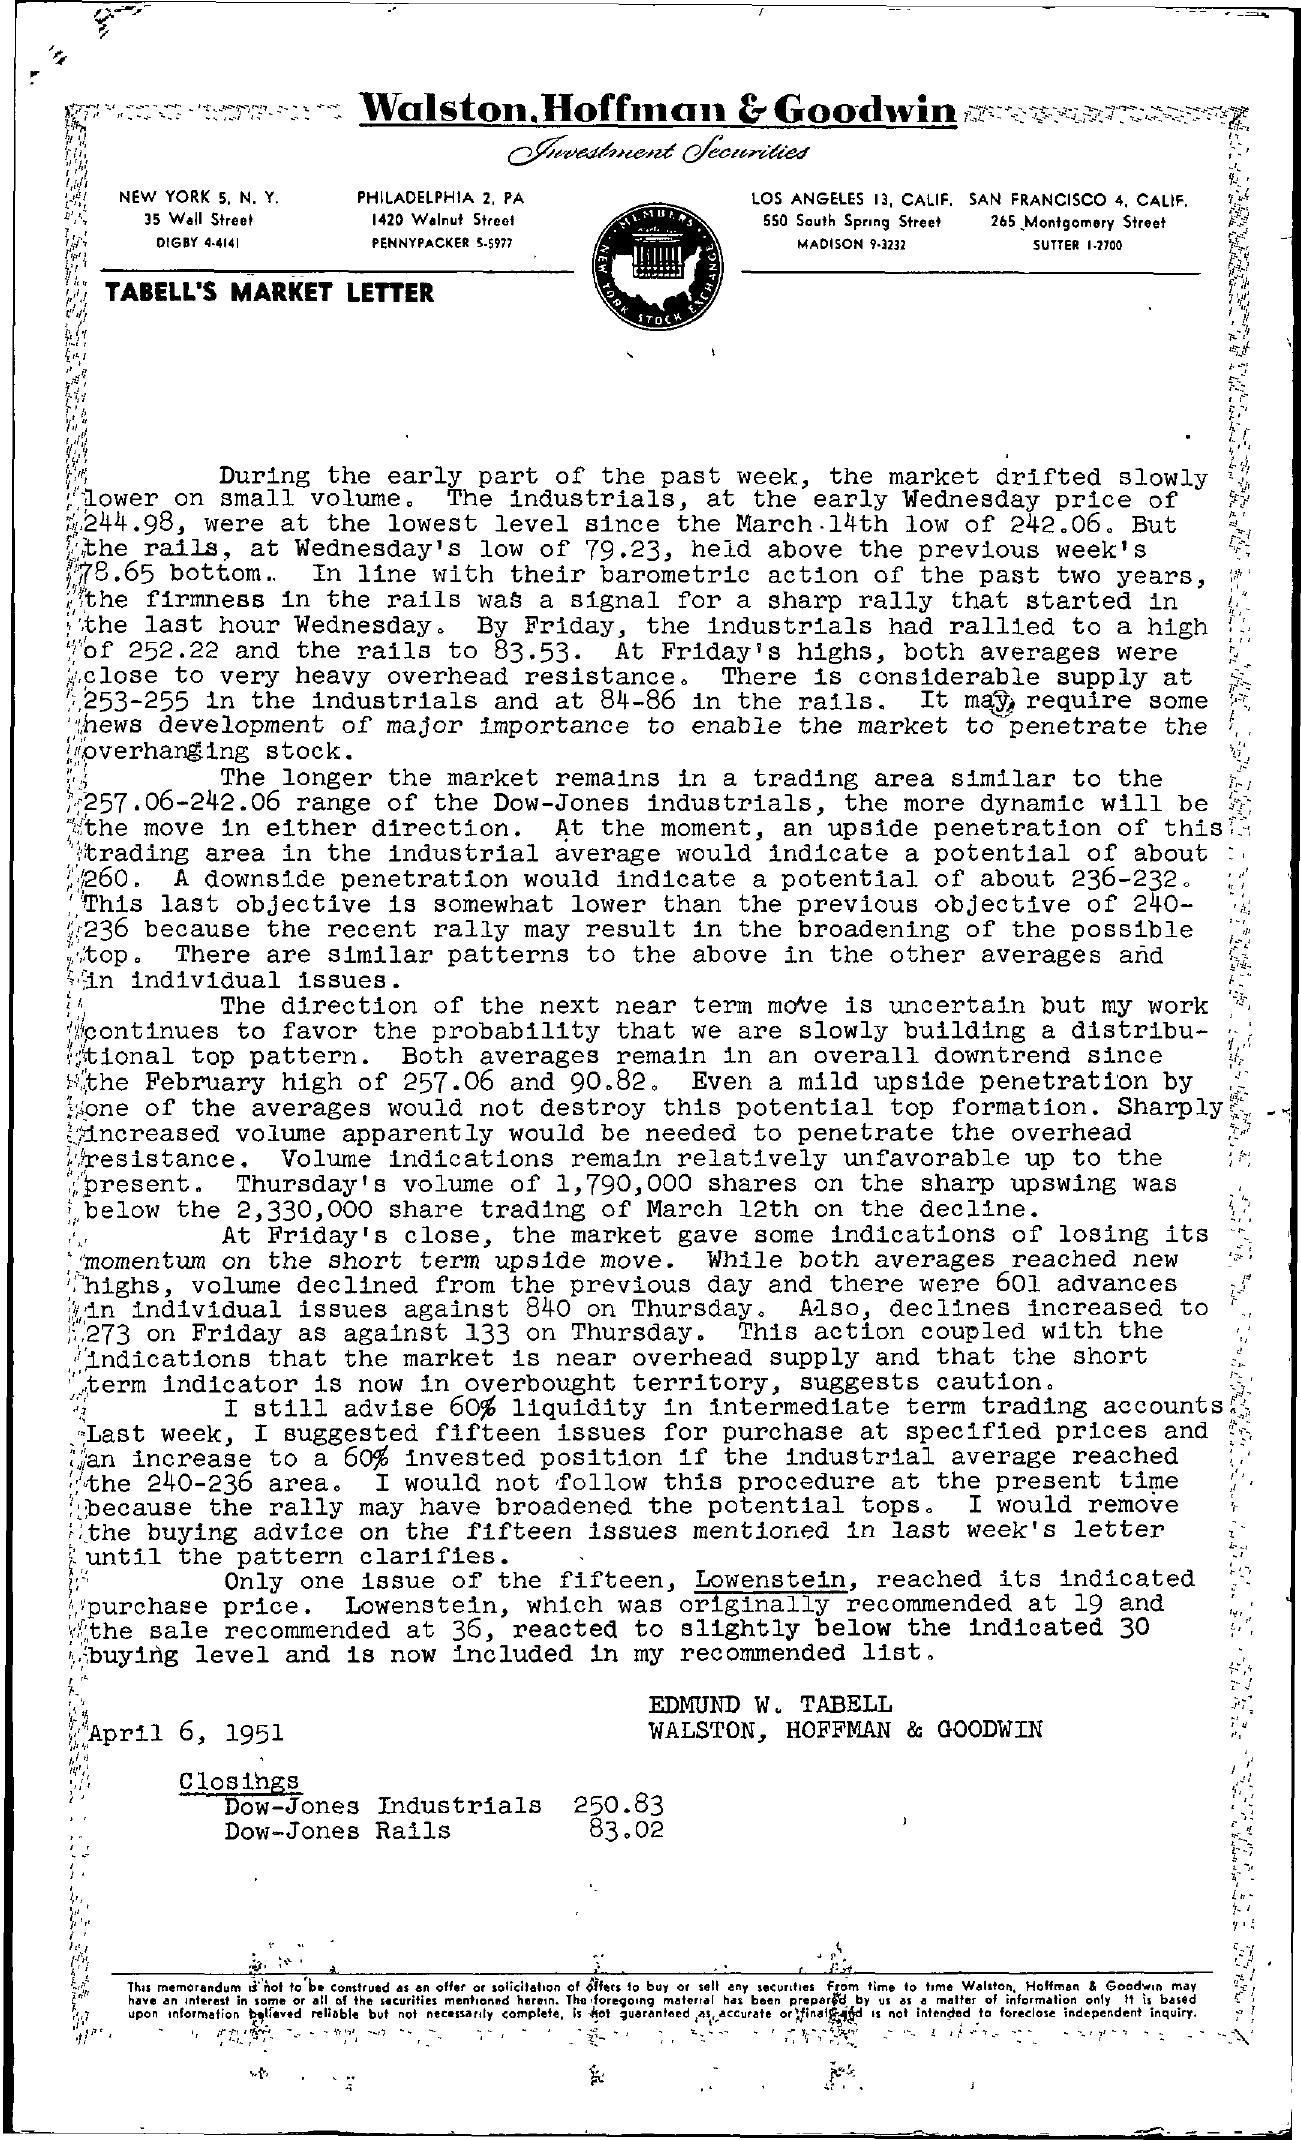 Tabell's Market Letter - April 06, 1951